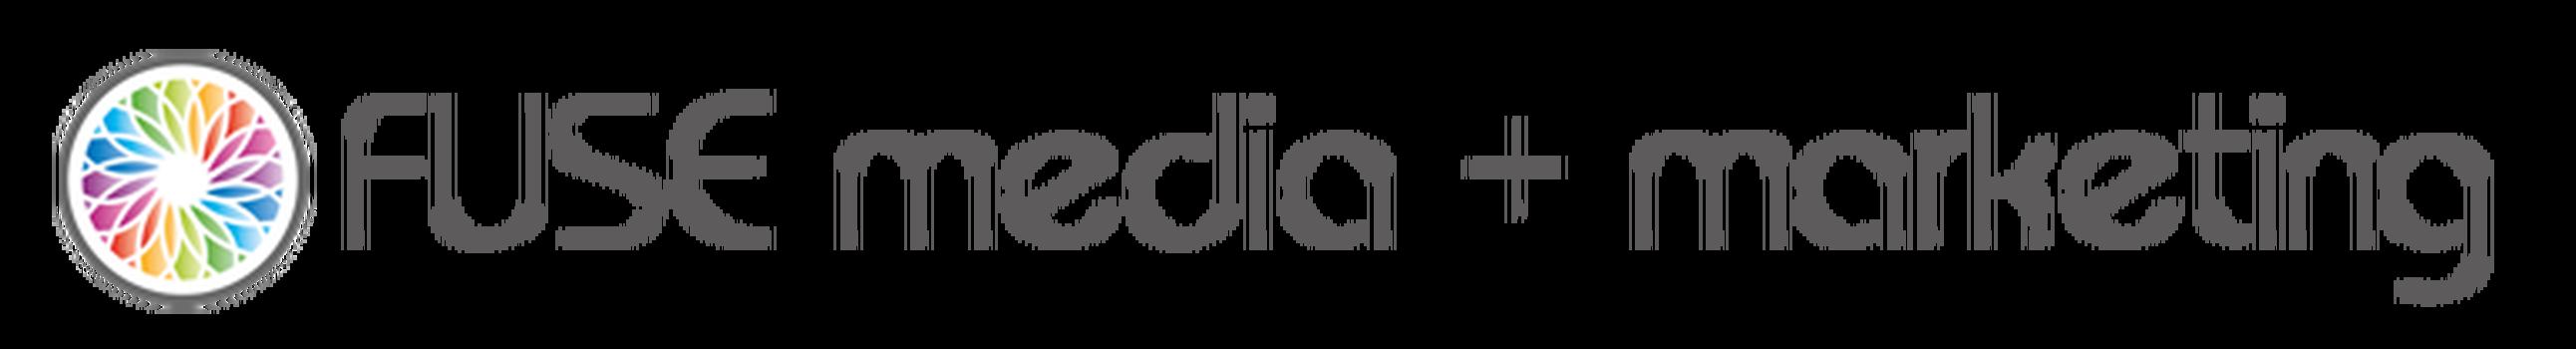 FUSE media + marketing logo